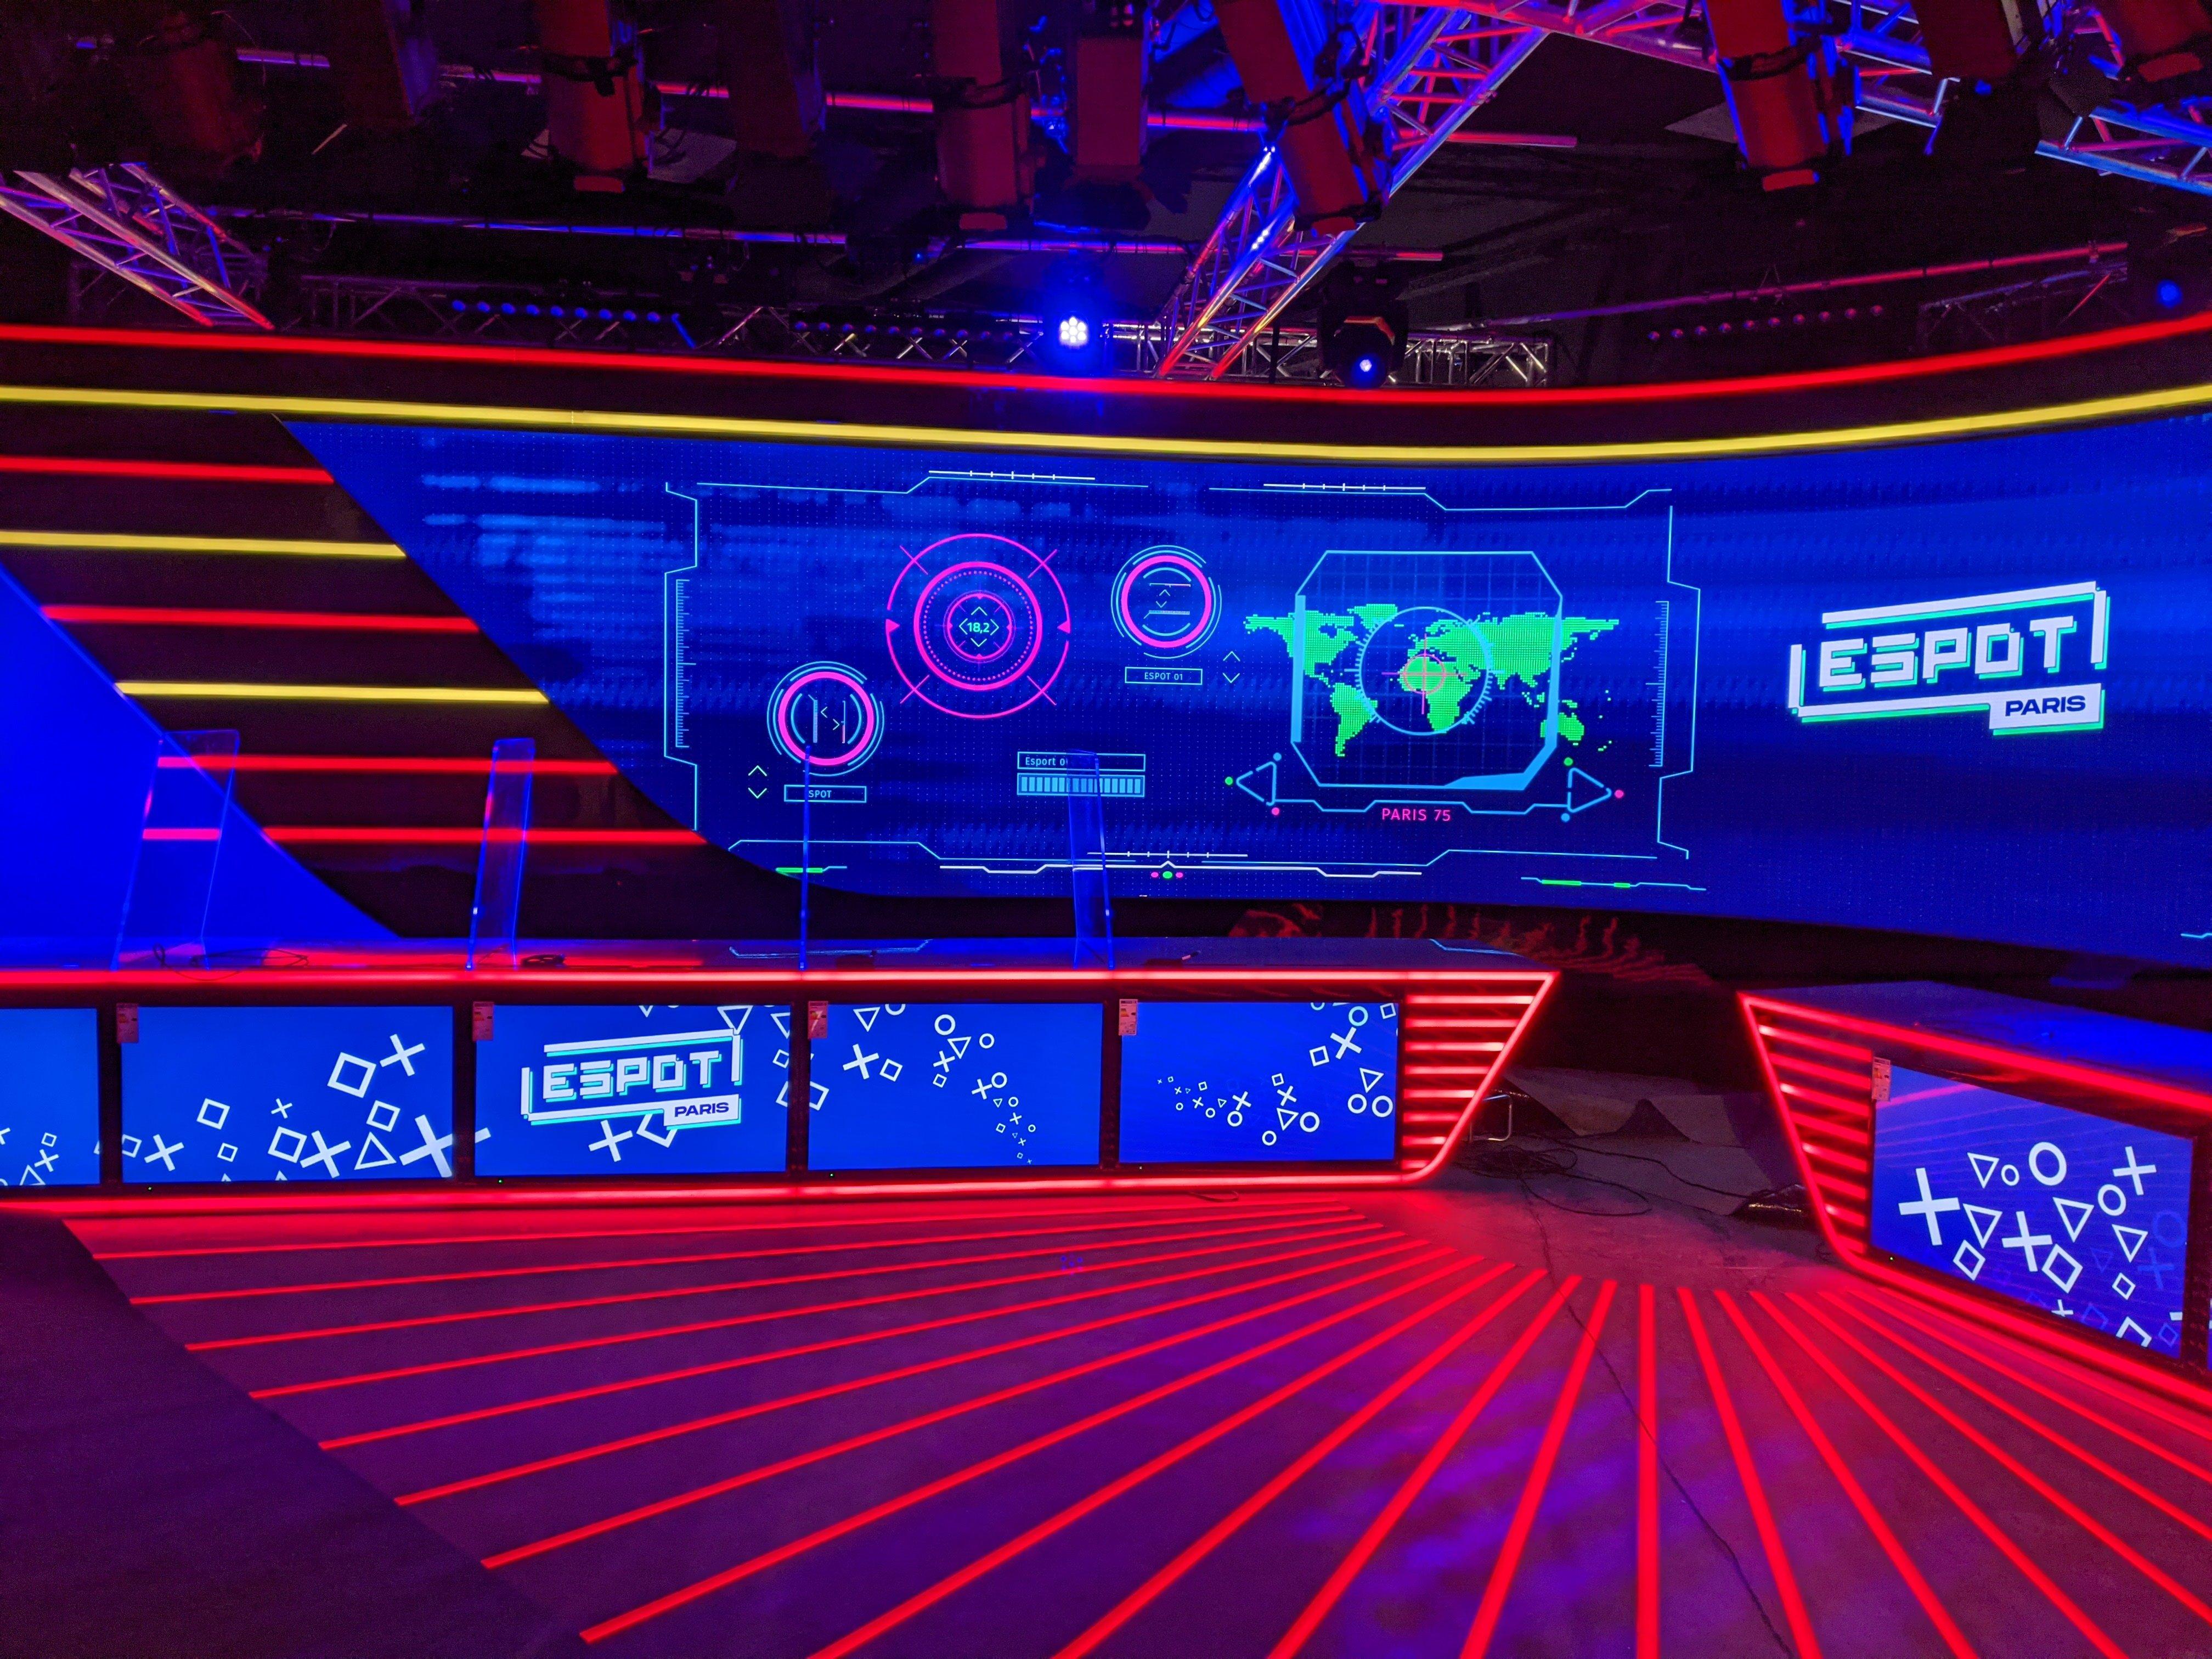 ESpot Arena's famous 30 square meters screen